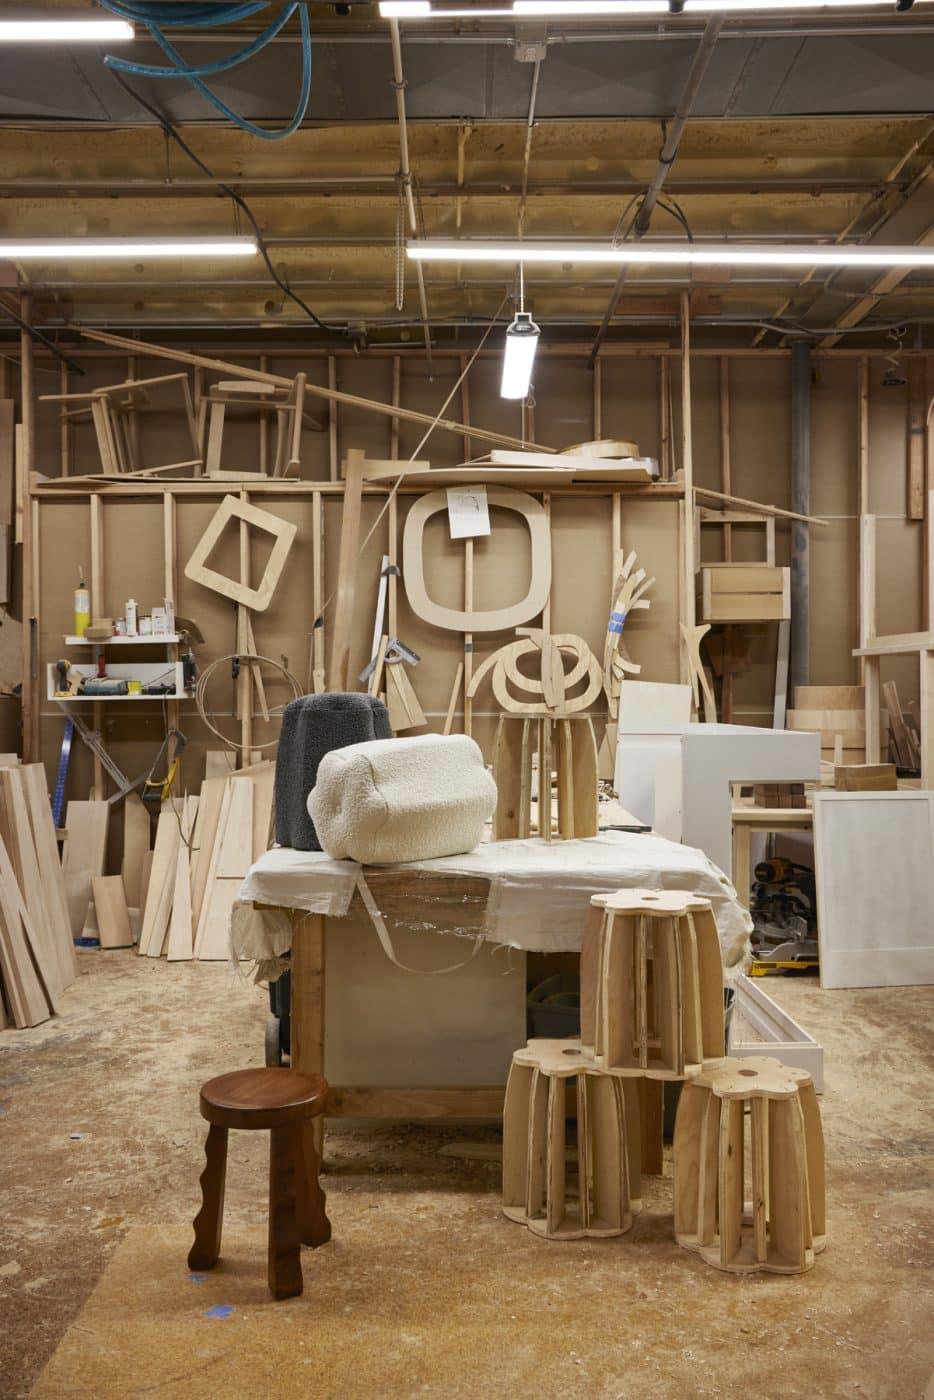 Christian Siriano furniture workshop